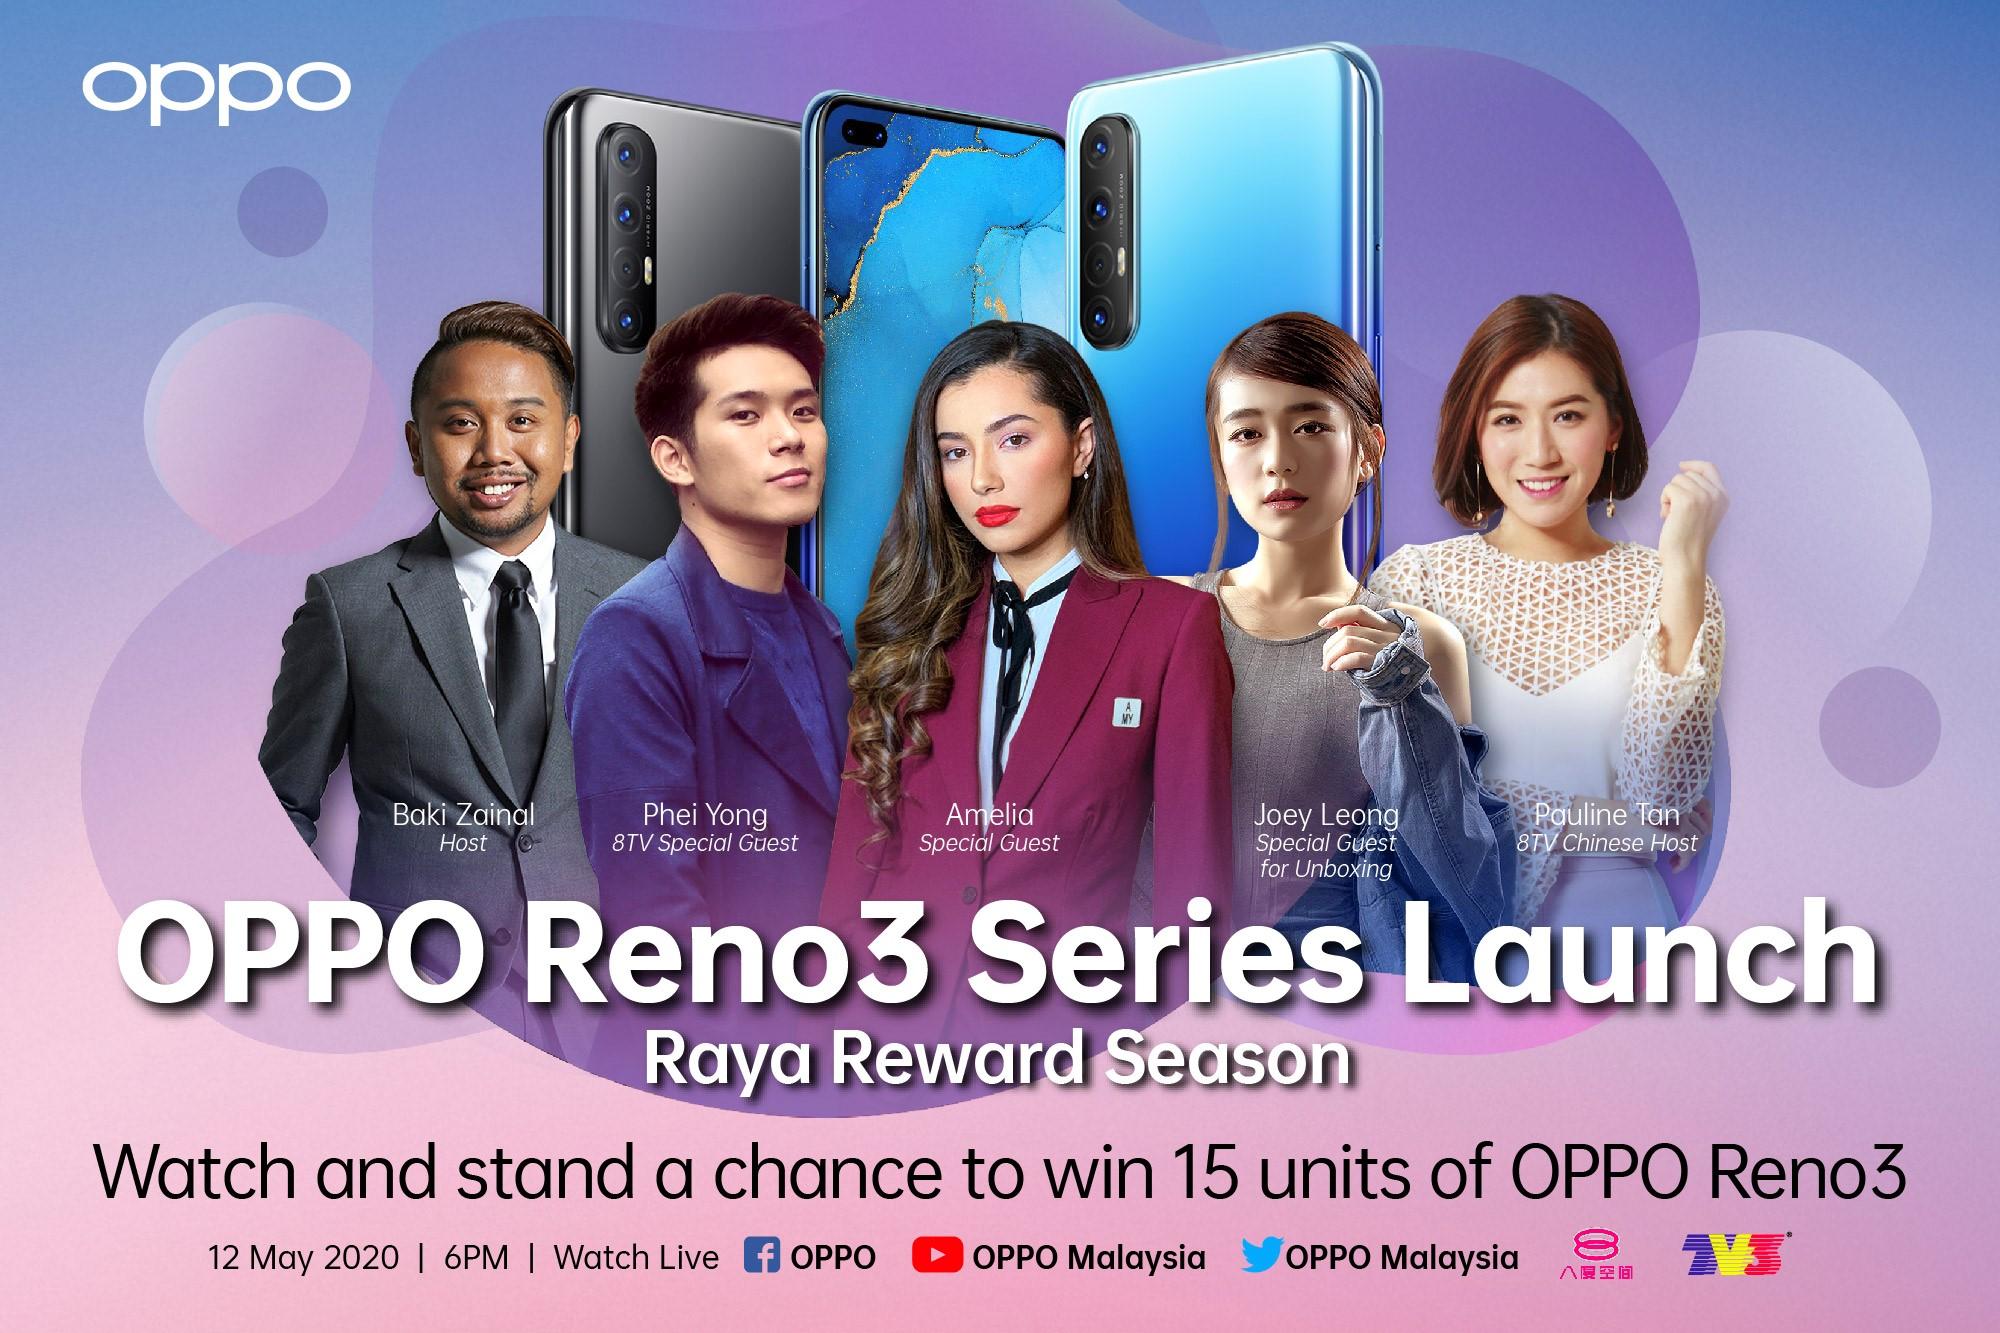 OPPO Reno3 launch